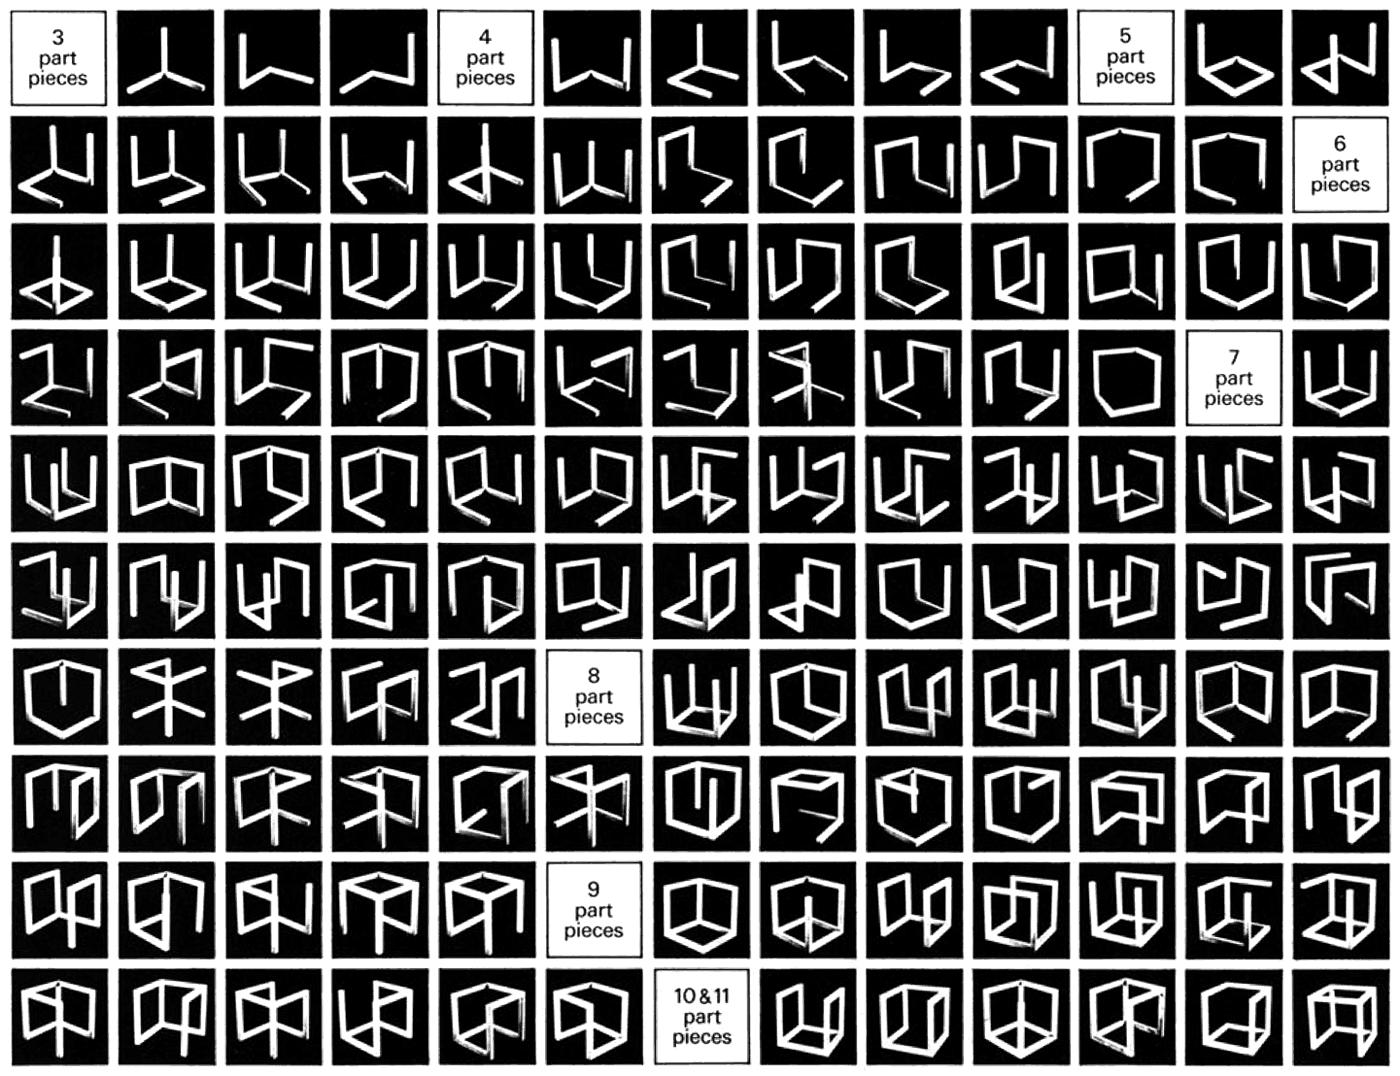 incomplete open cubes le witt